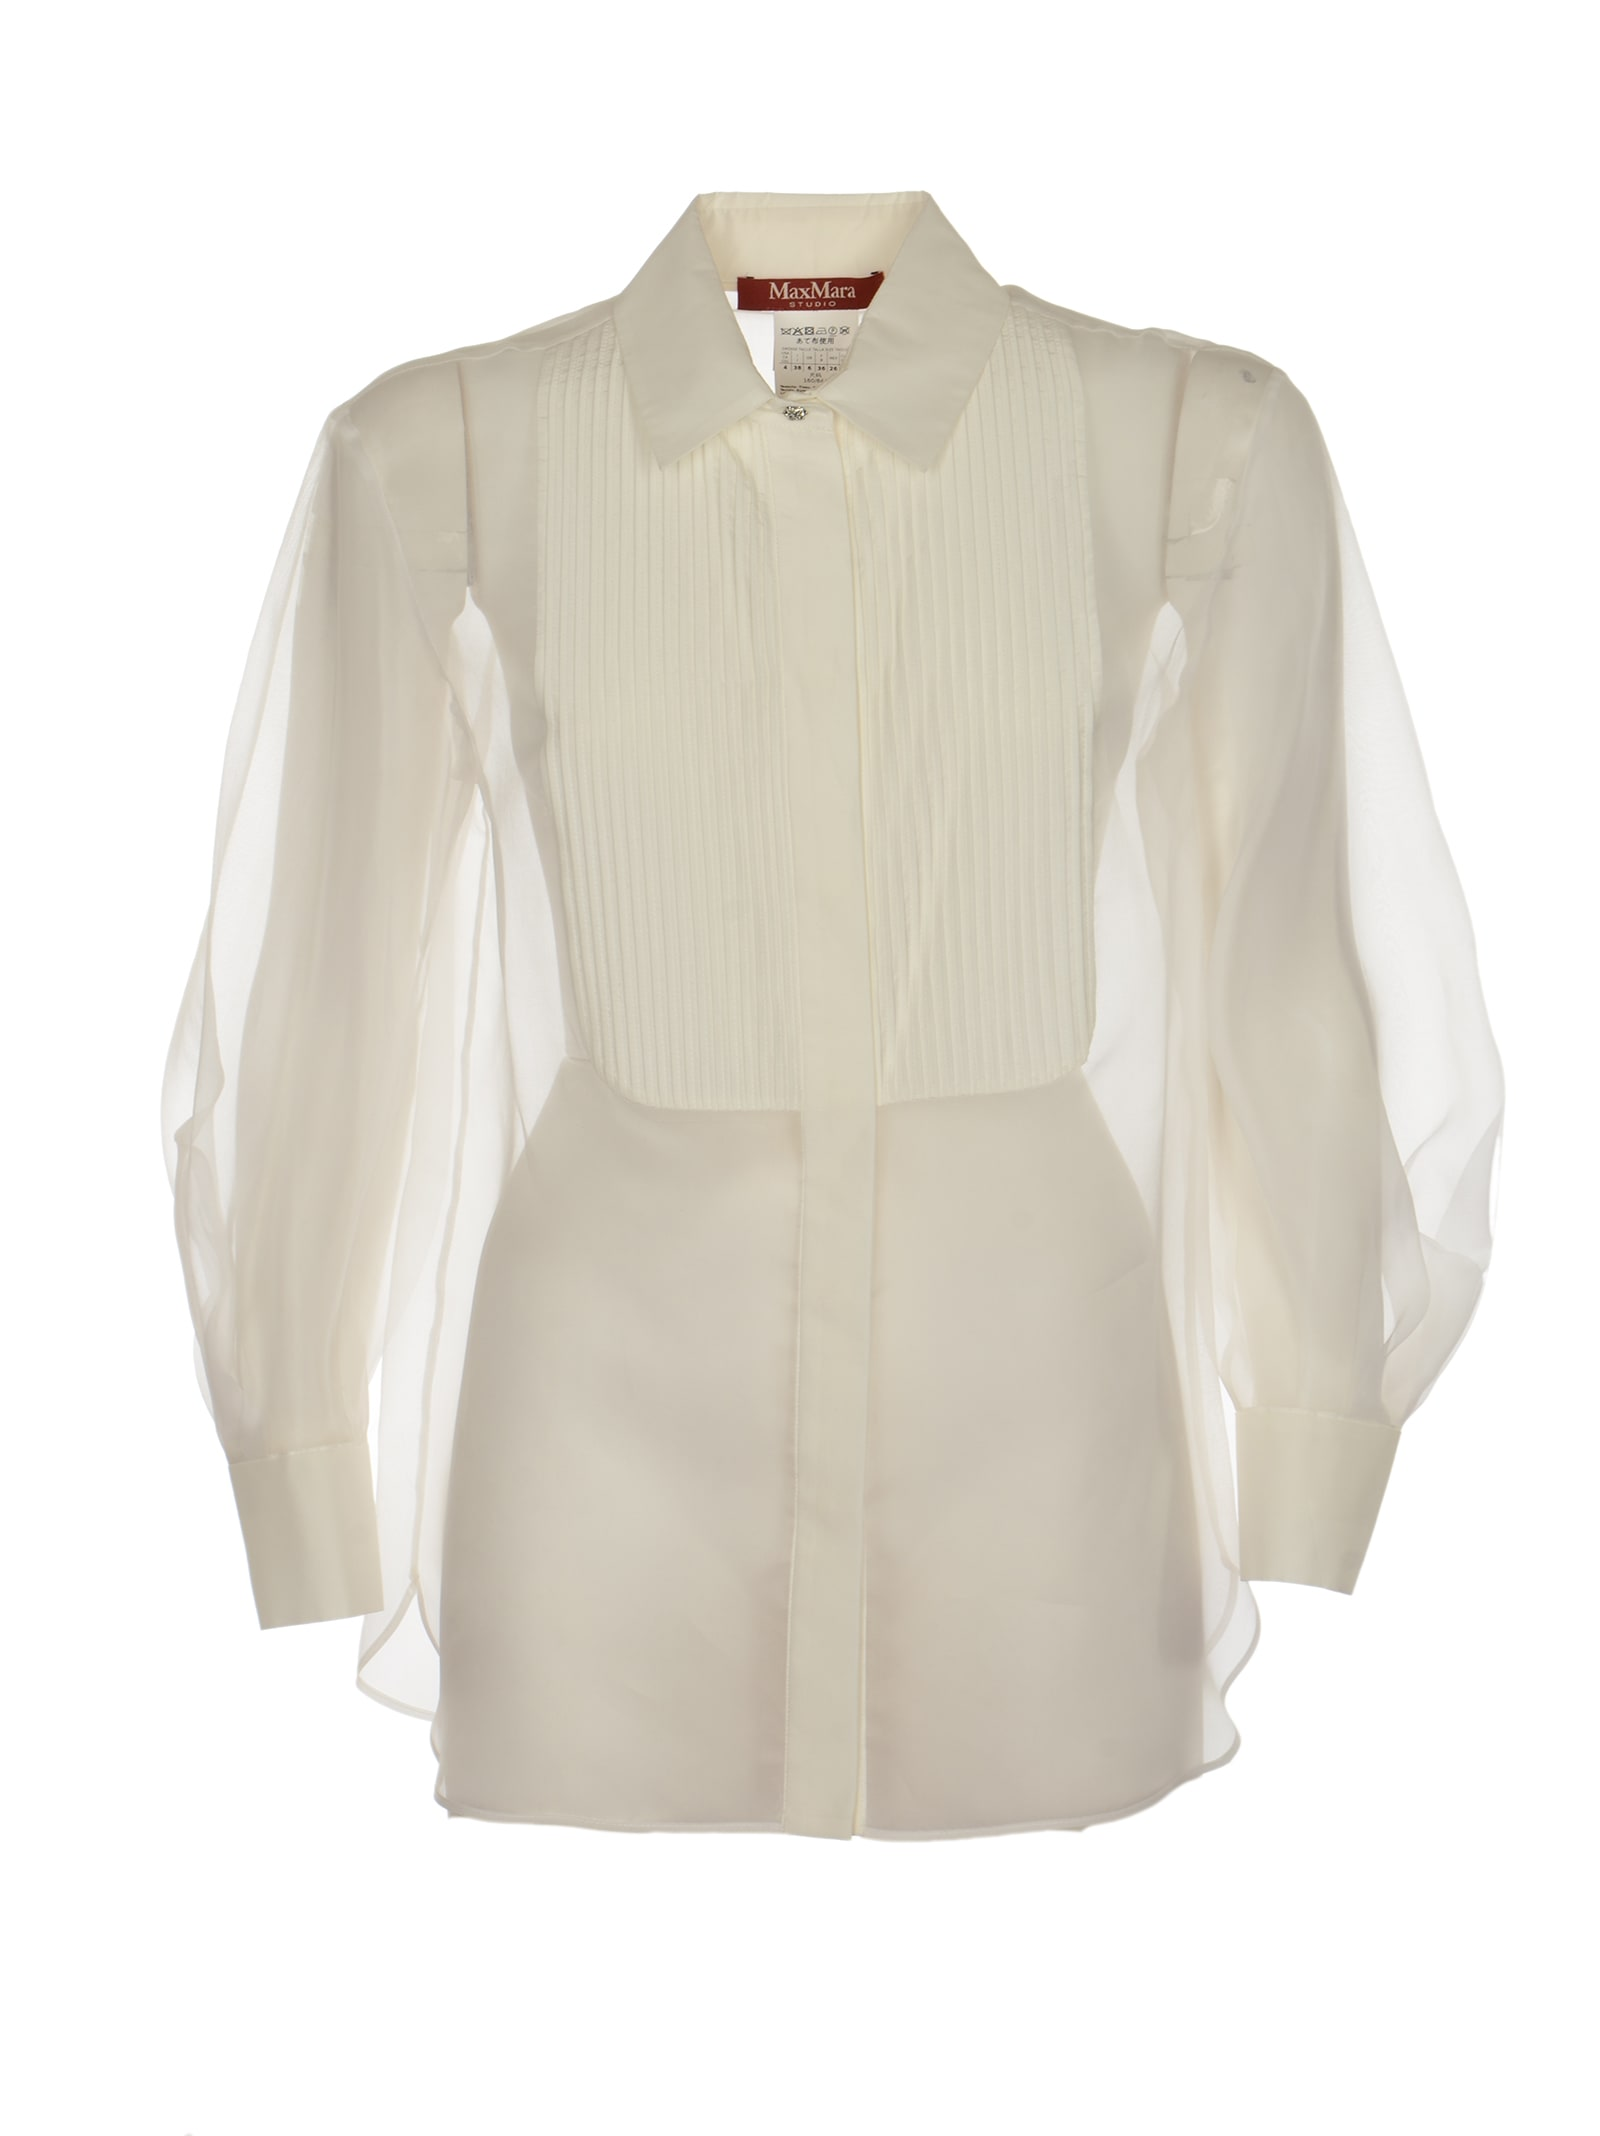 Avon Shirt